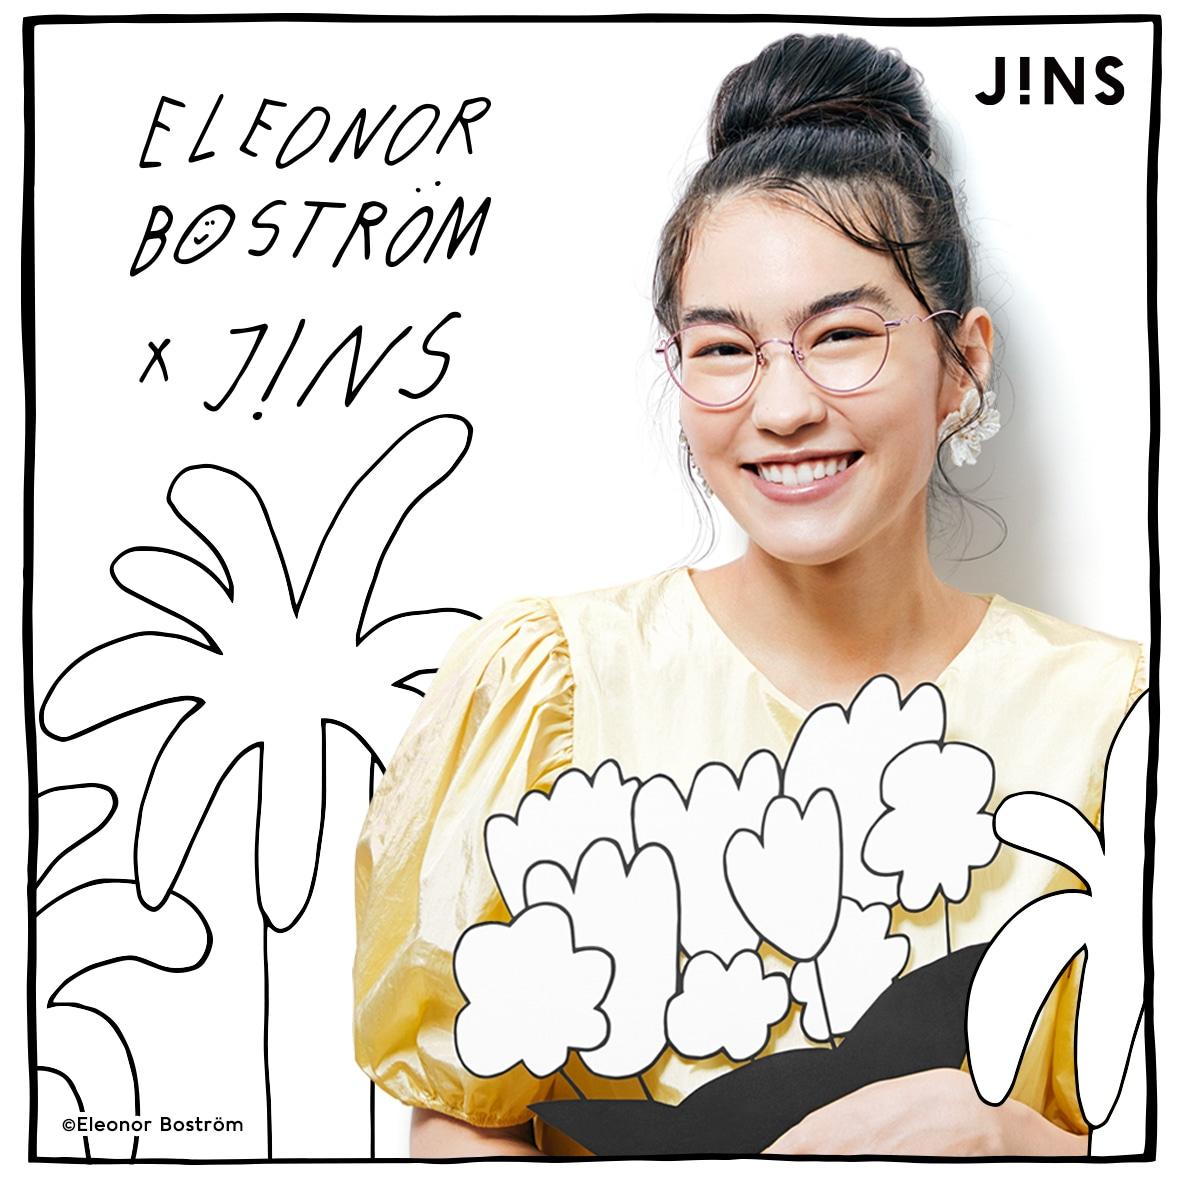 Eleonor Boström × JINS